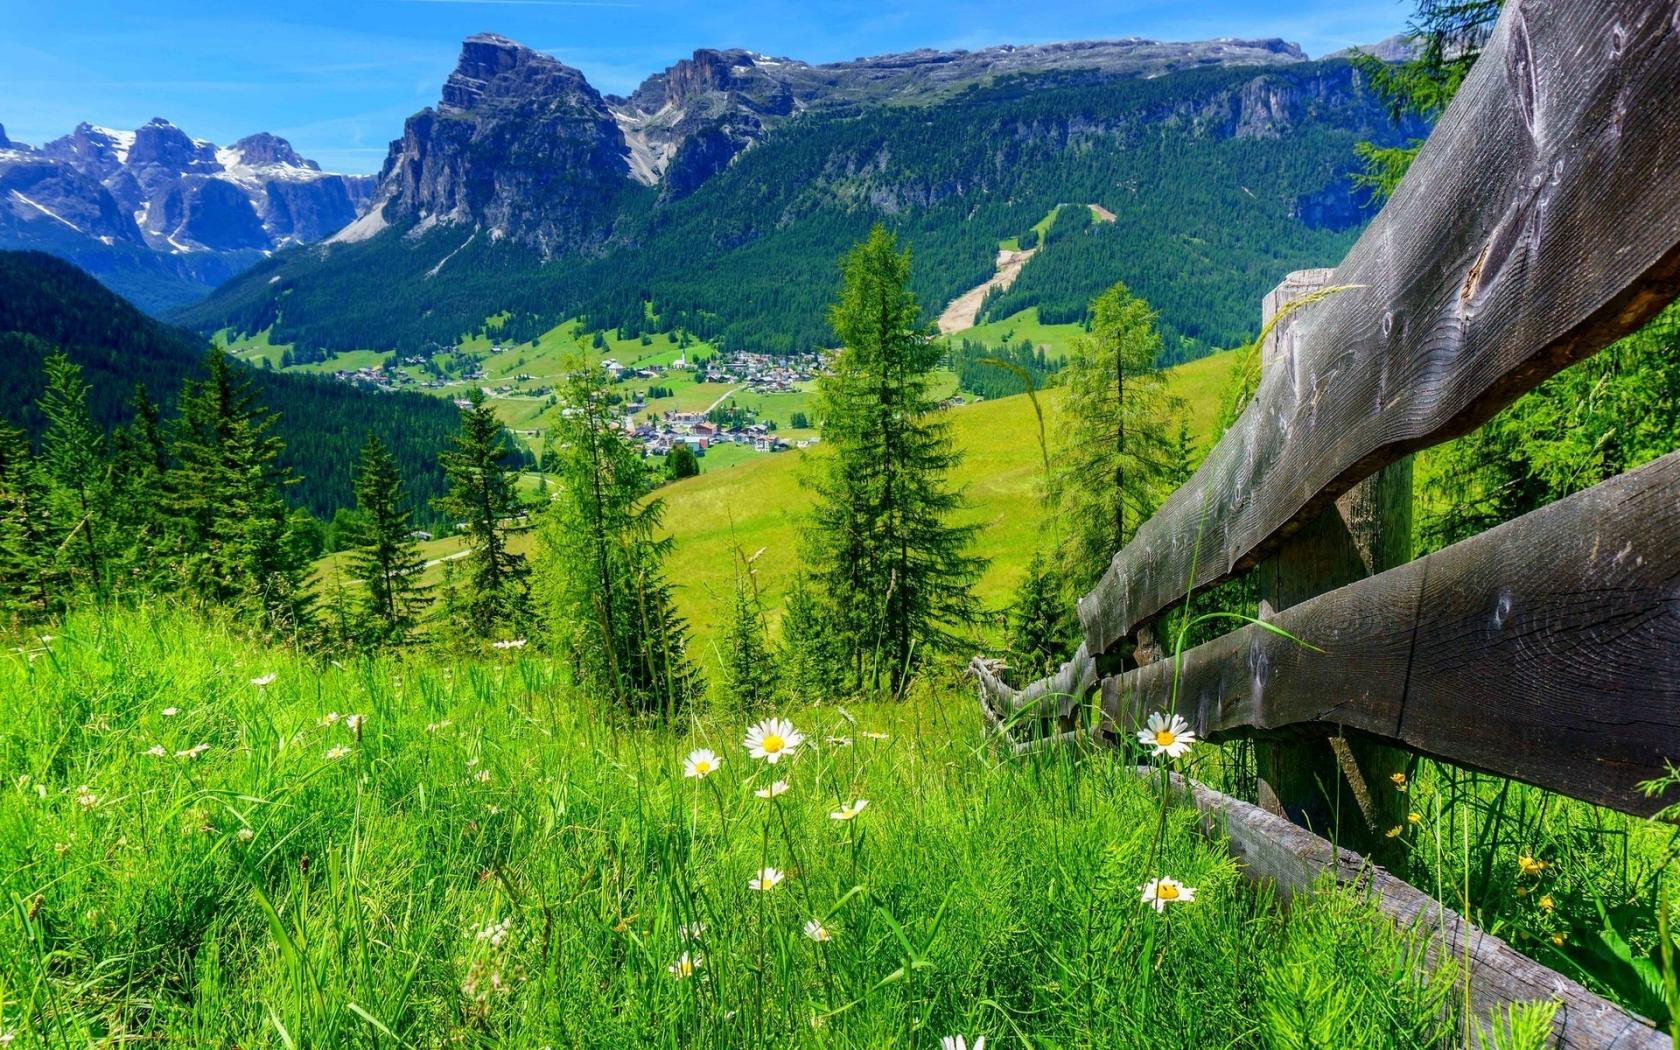 Spring Mountain Landscape 1680 X 1050 Widescreen Wallpaper